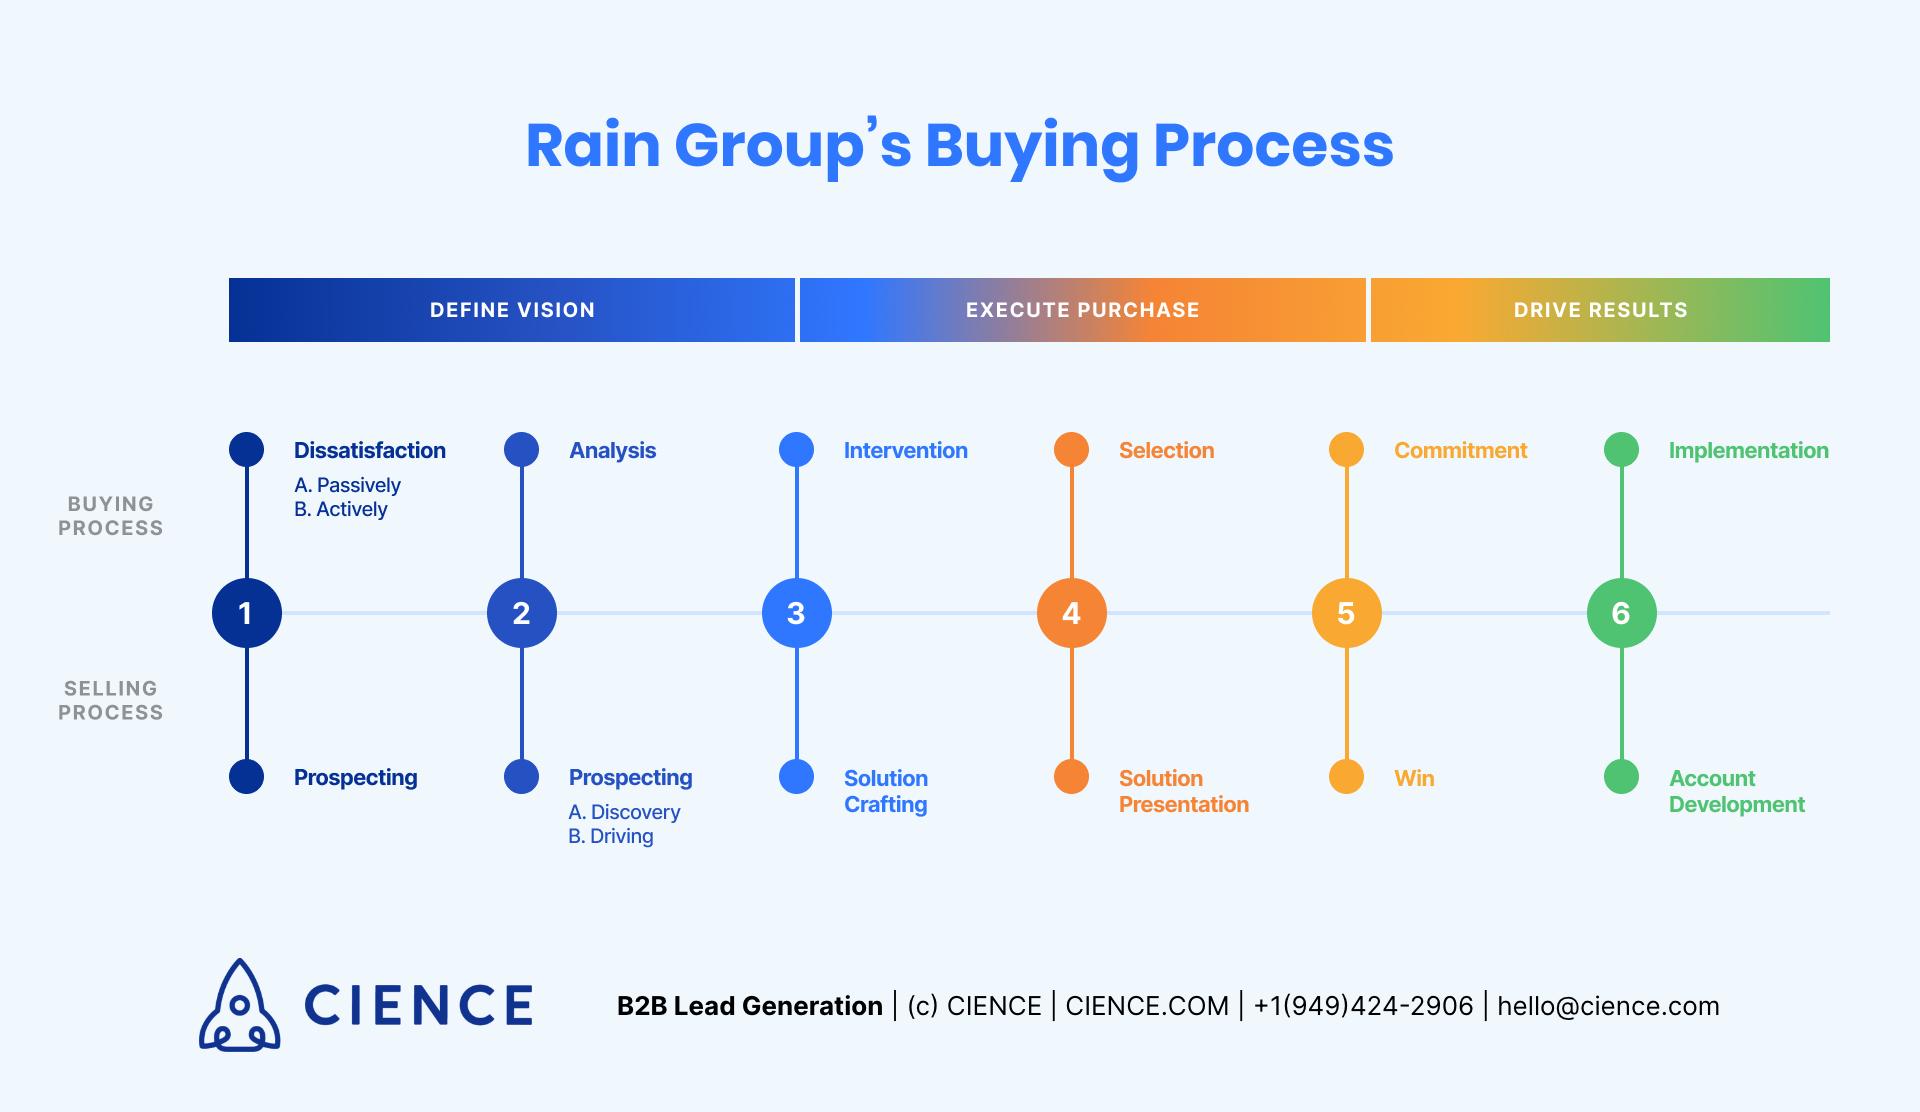 Rain Group's Buying Process Model